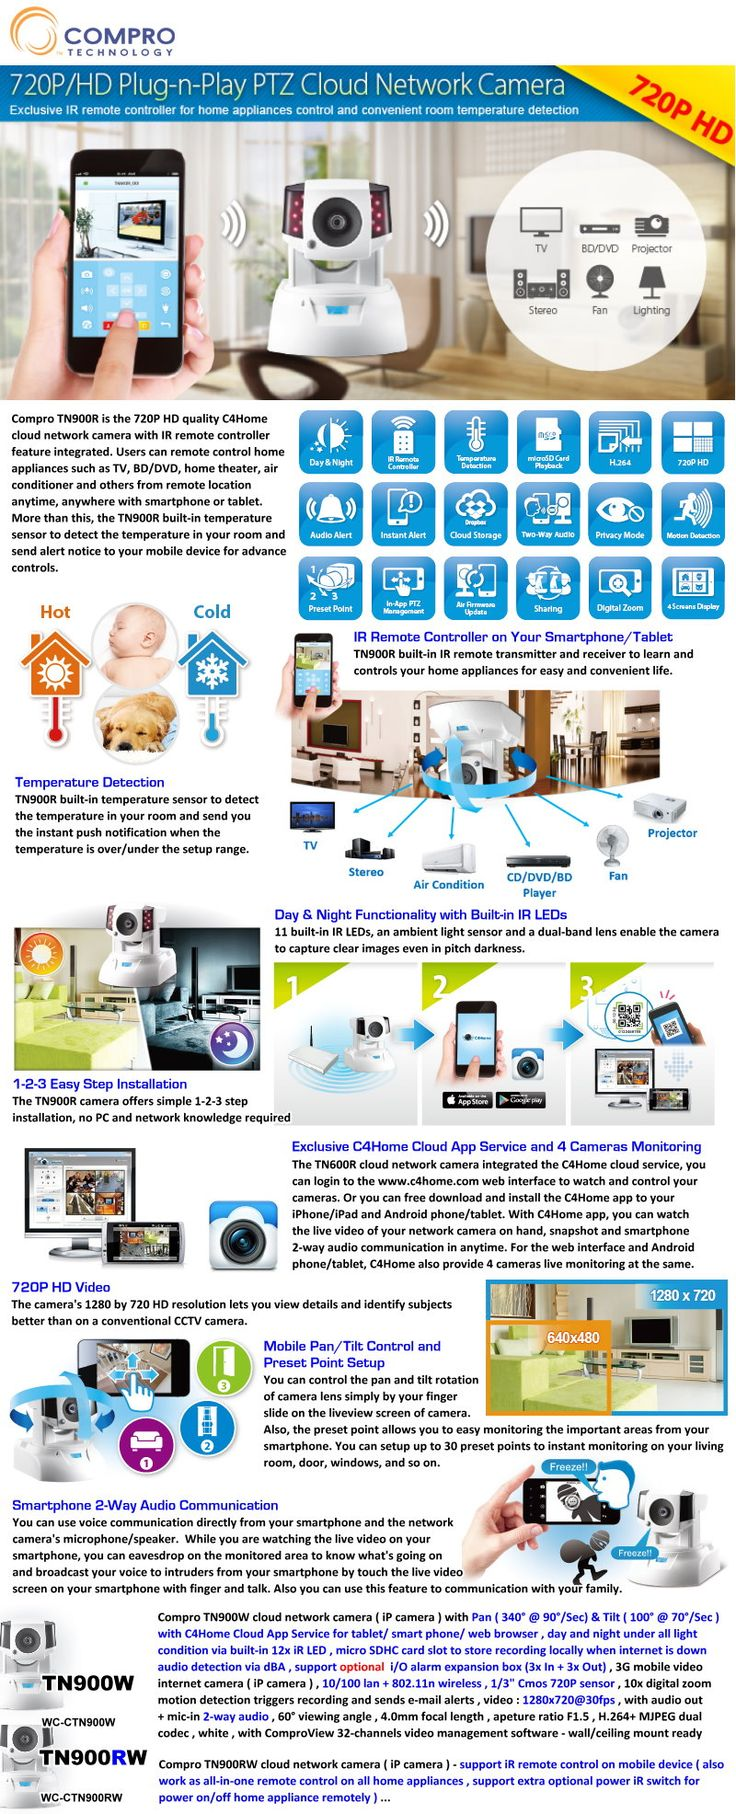 Plug-n-Play PTZ Cloud Network Camera